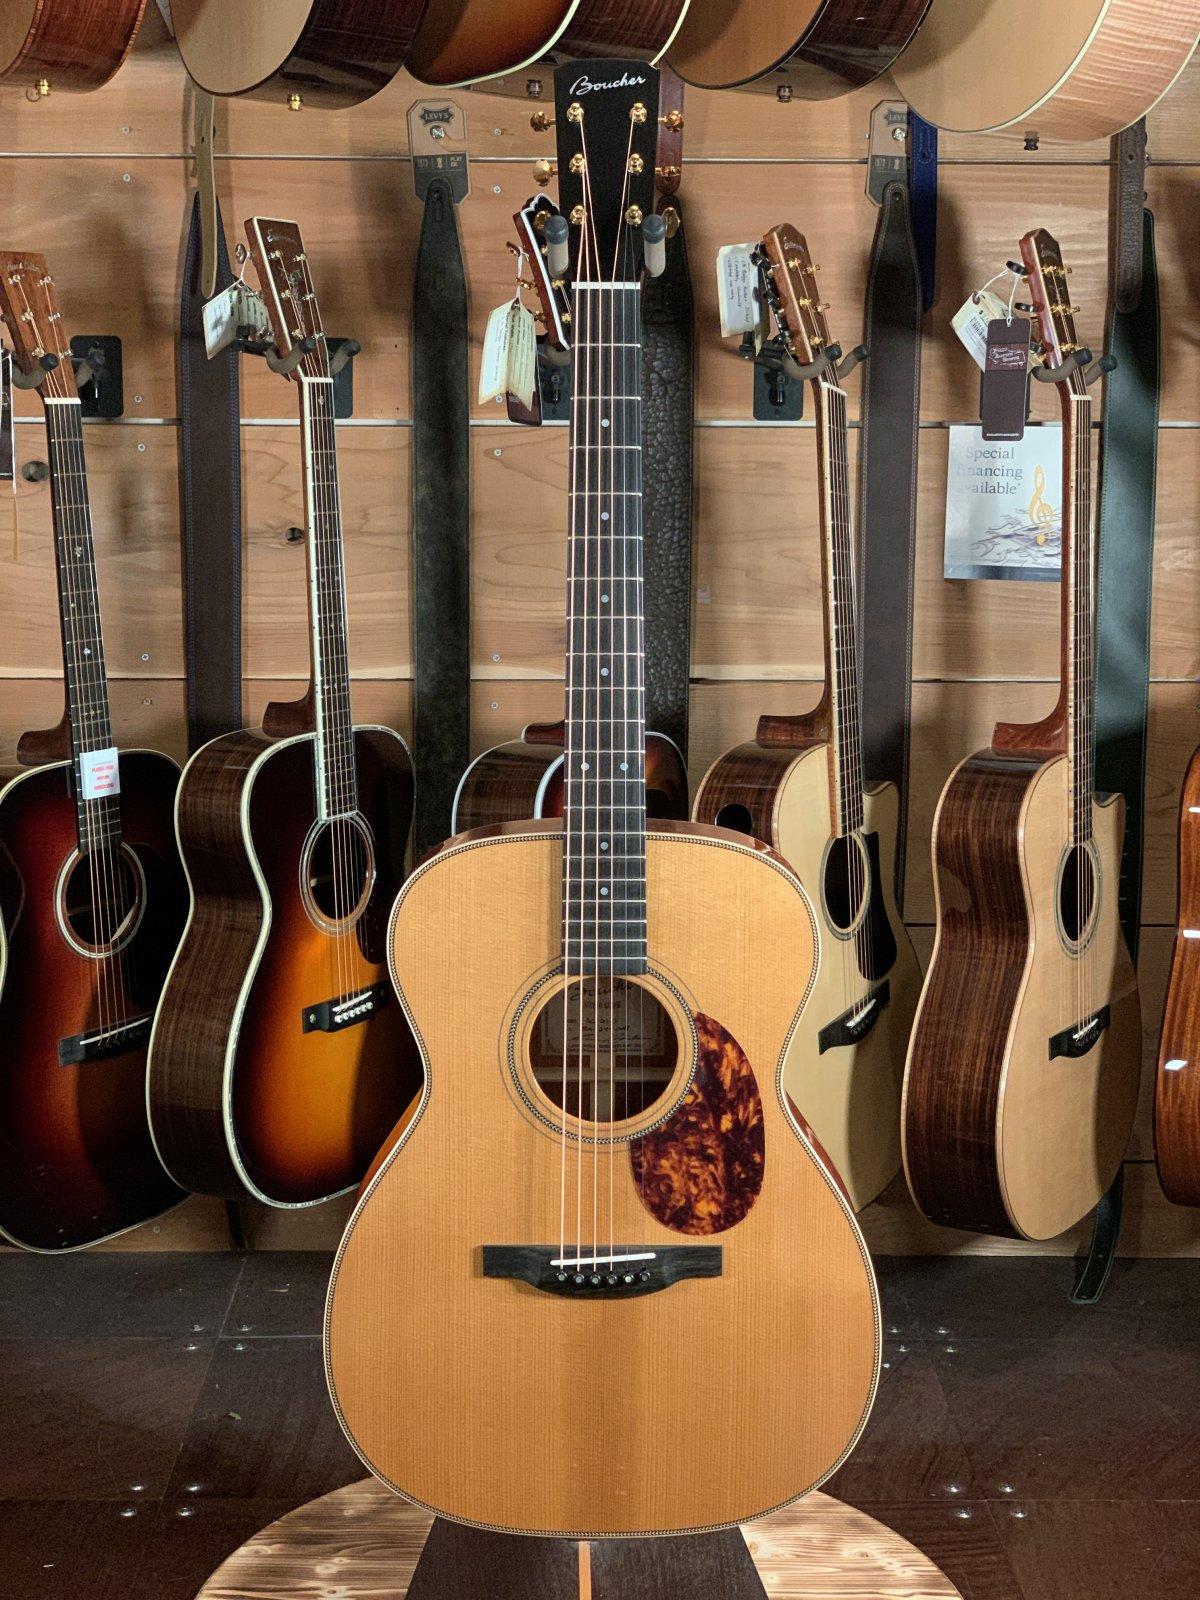 Boucher SG-21-G AAAA Torrefied Adirondack/African Bubinga 14 Fret OM Acoustic #BA-1277-OMH